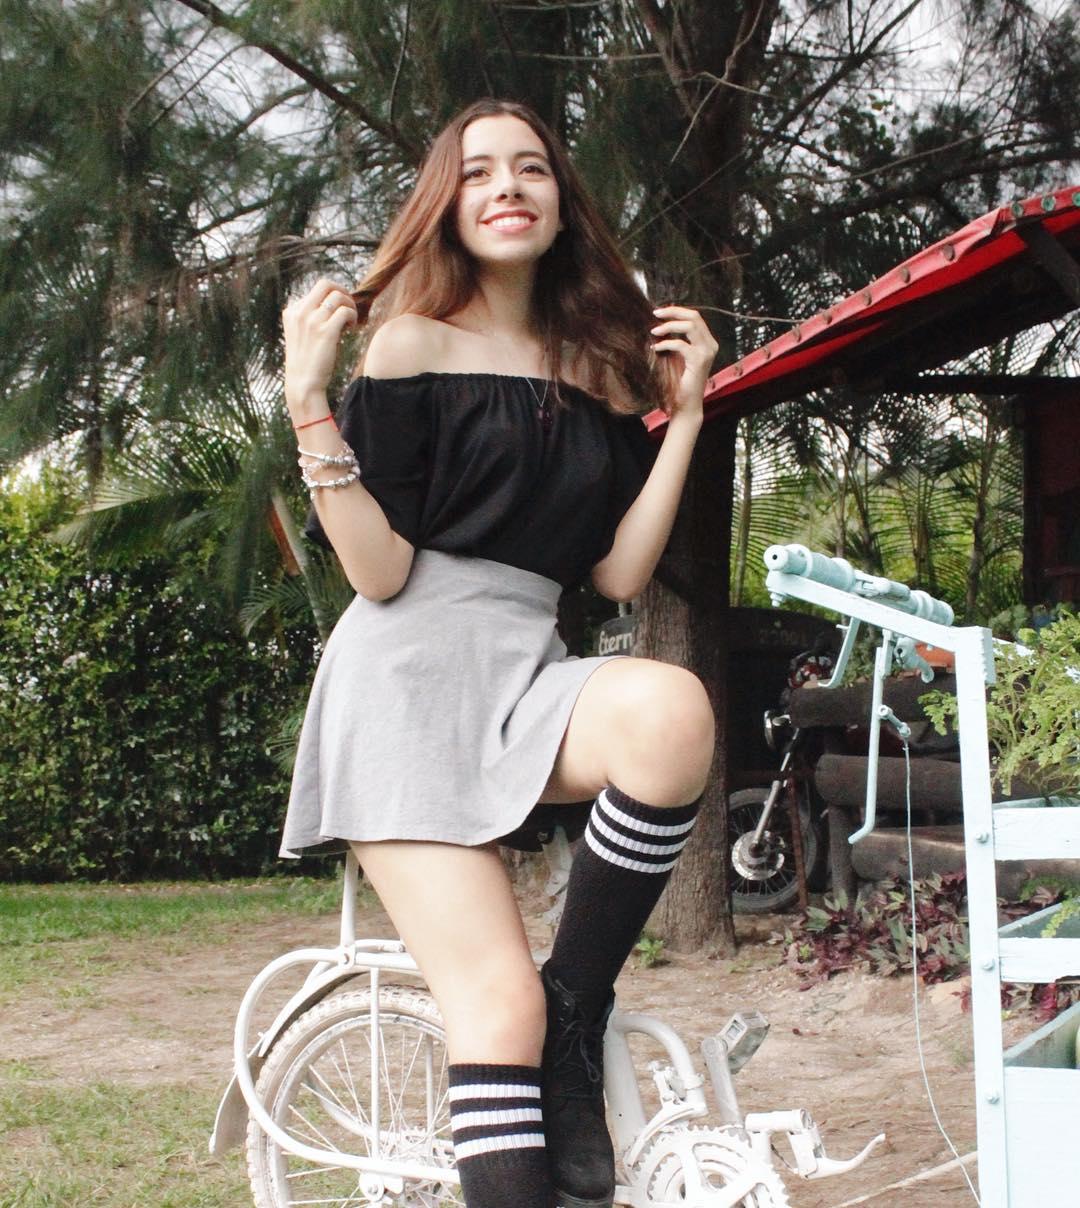 maya mejia ospina, miss teen mundial colombia 2019. 53735611